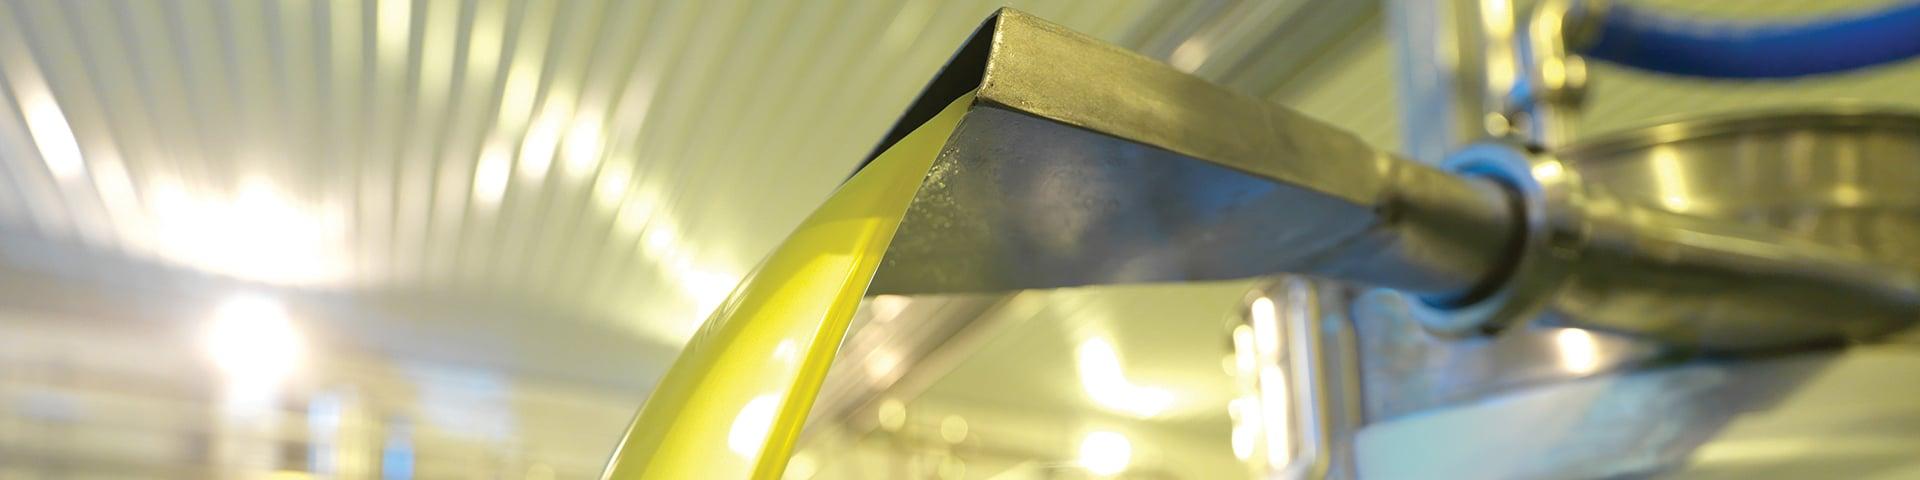 Olive Oil Booster herobanner 1920x480 1